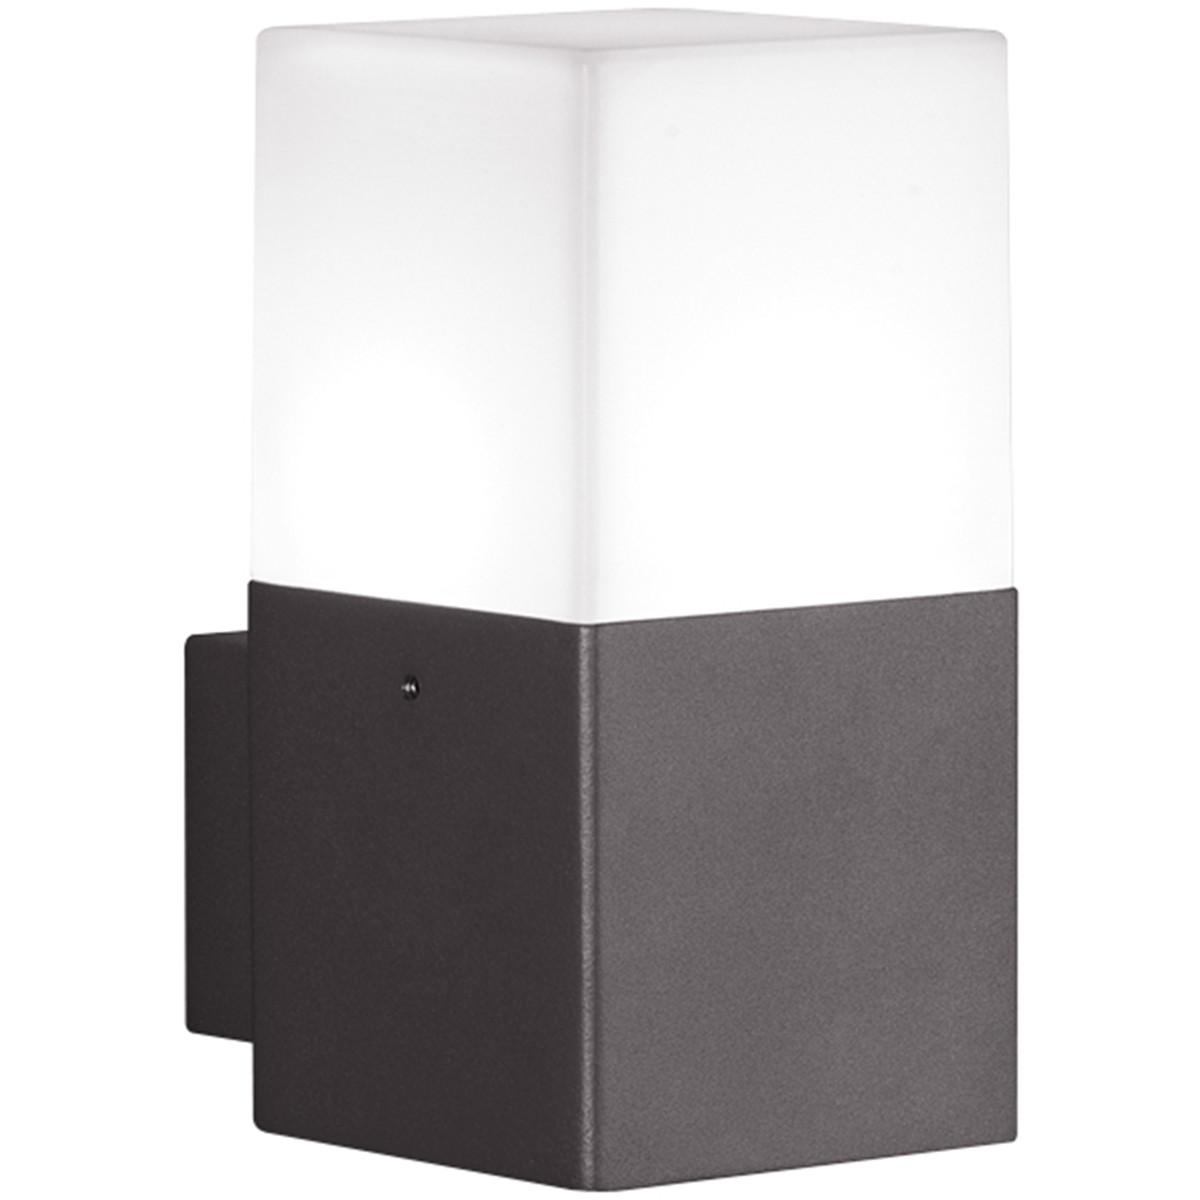 LED Tuinverlichting - Tuinlamp - Trion Hudsy - Wand - 4W - Warm Wit 3000K - Vierkant - Mat Zwart - A